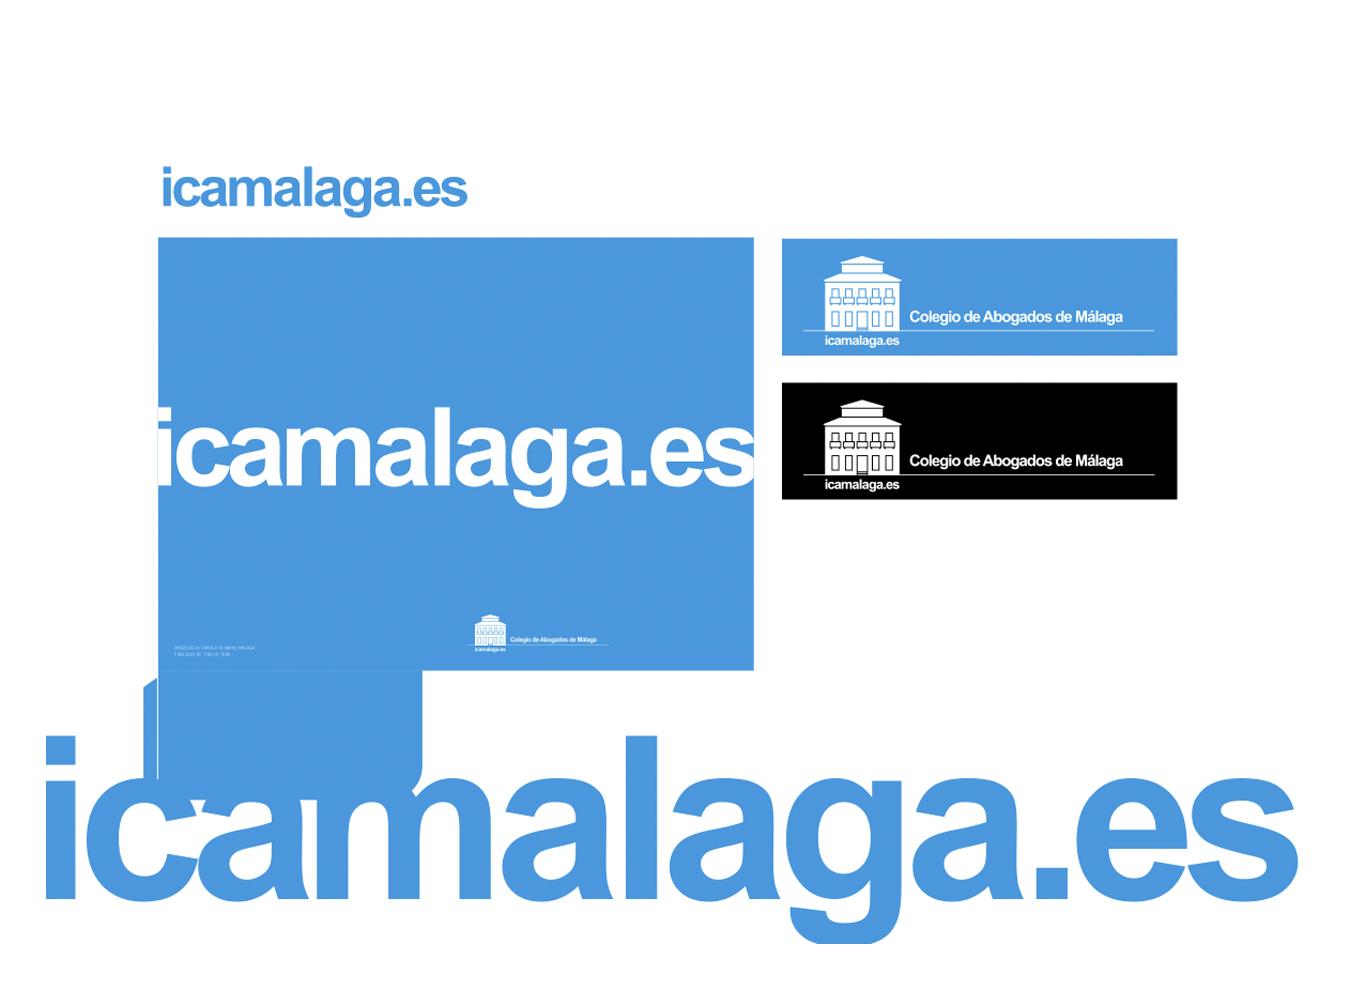 COLEGIO-DE-ABOGADOS-DE-MALAGA-LOGO